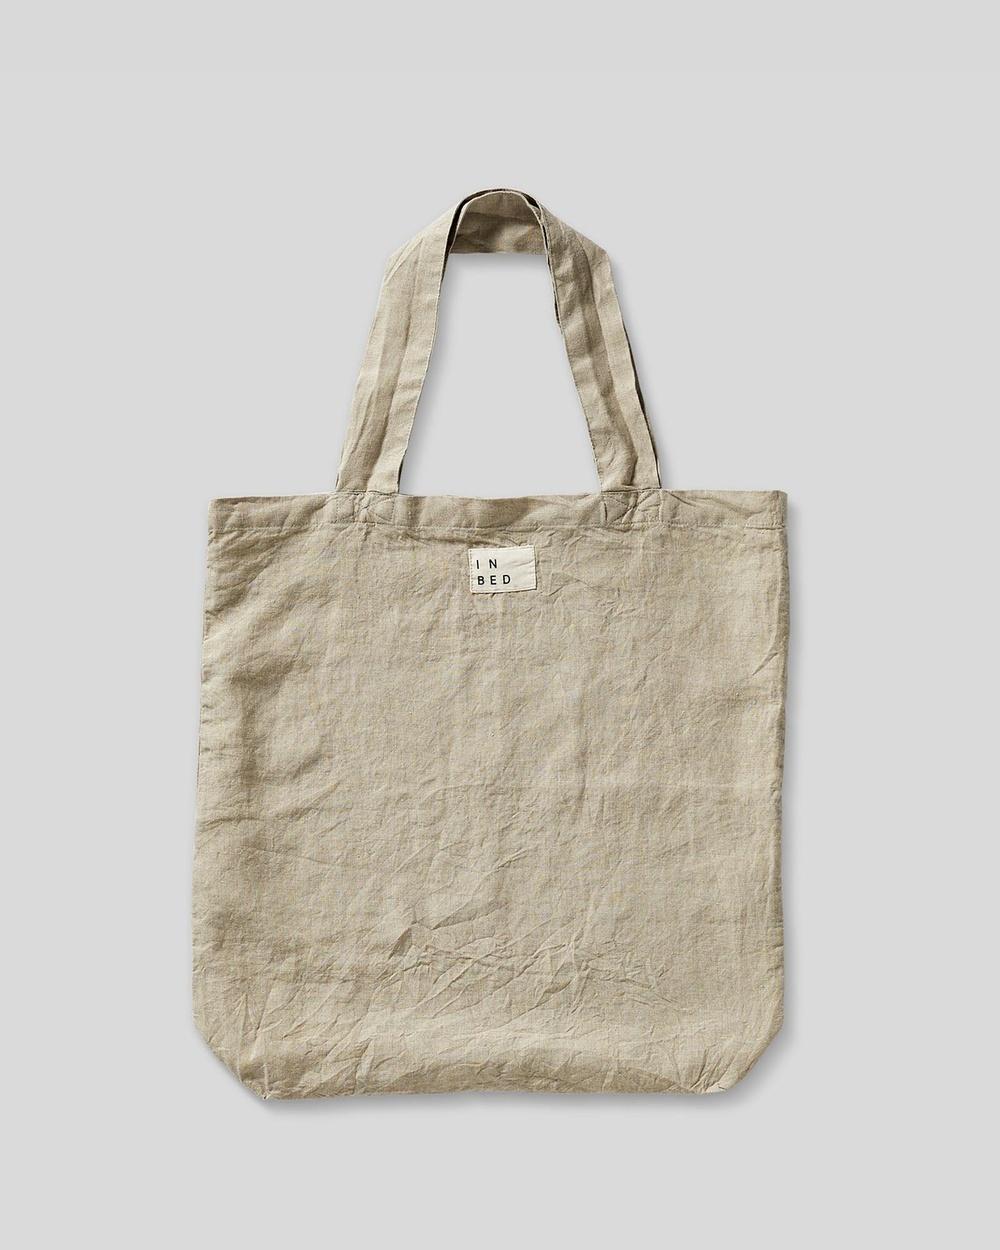 IN BED Linen Market Bag Bags Natural Australia